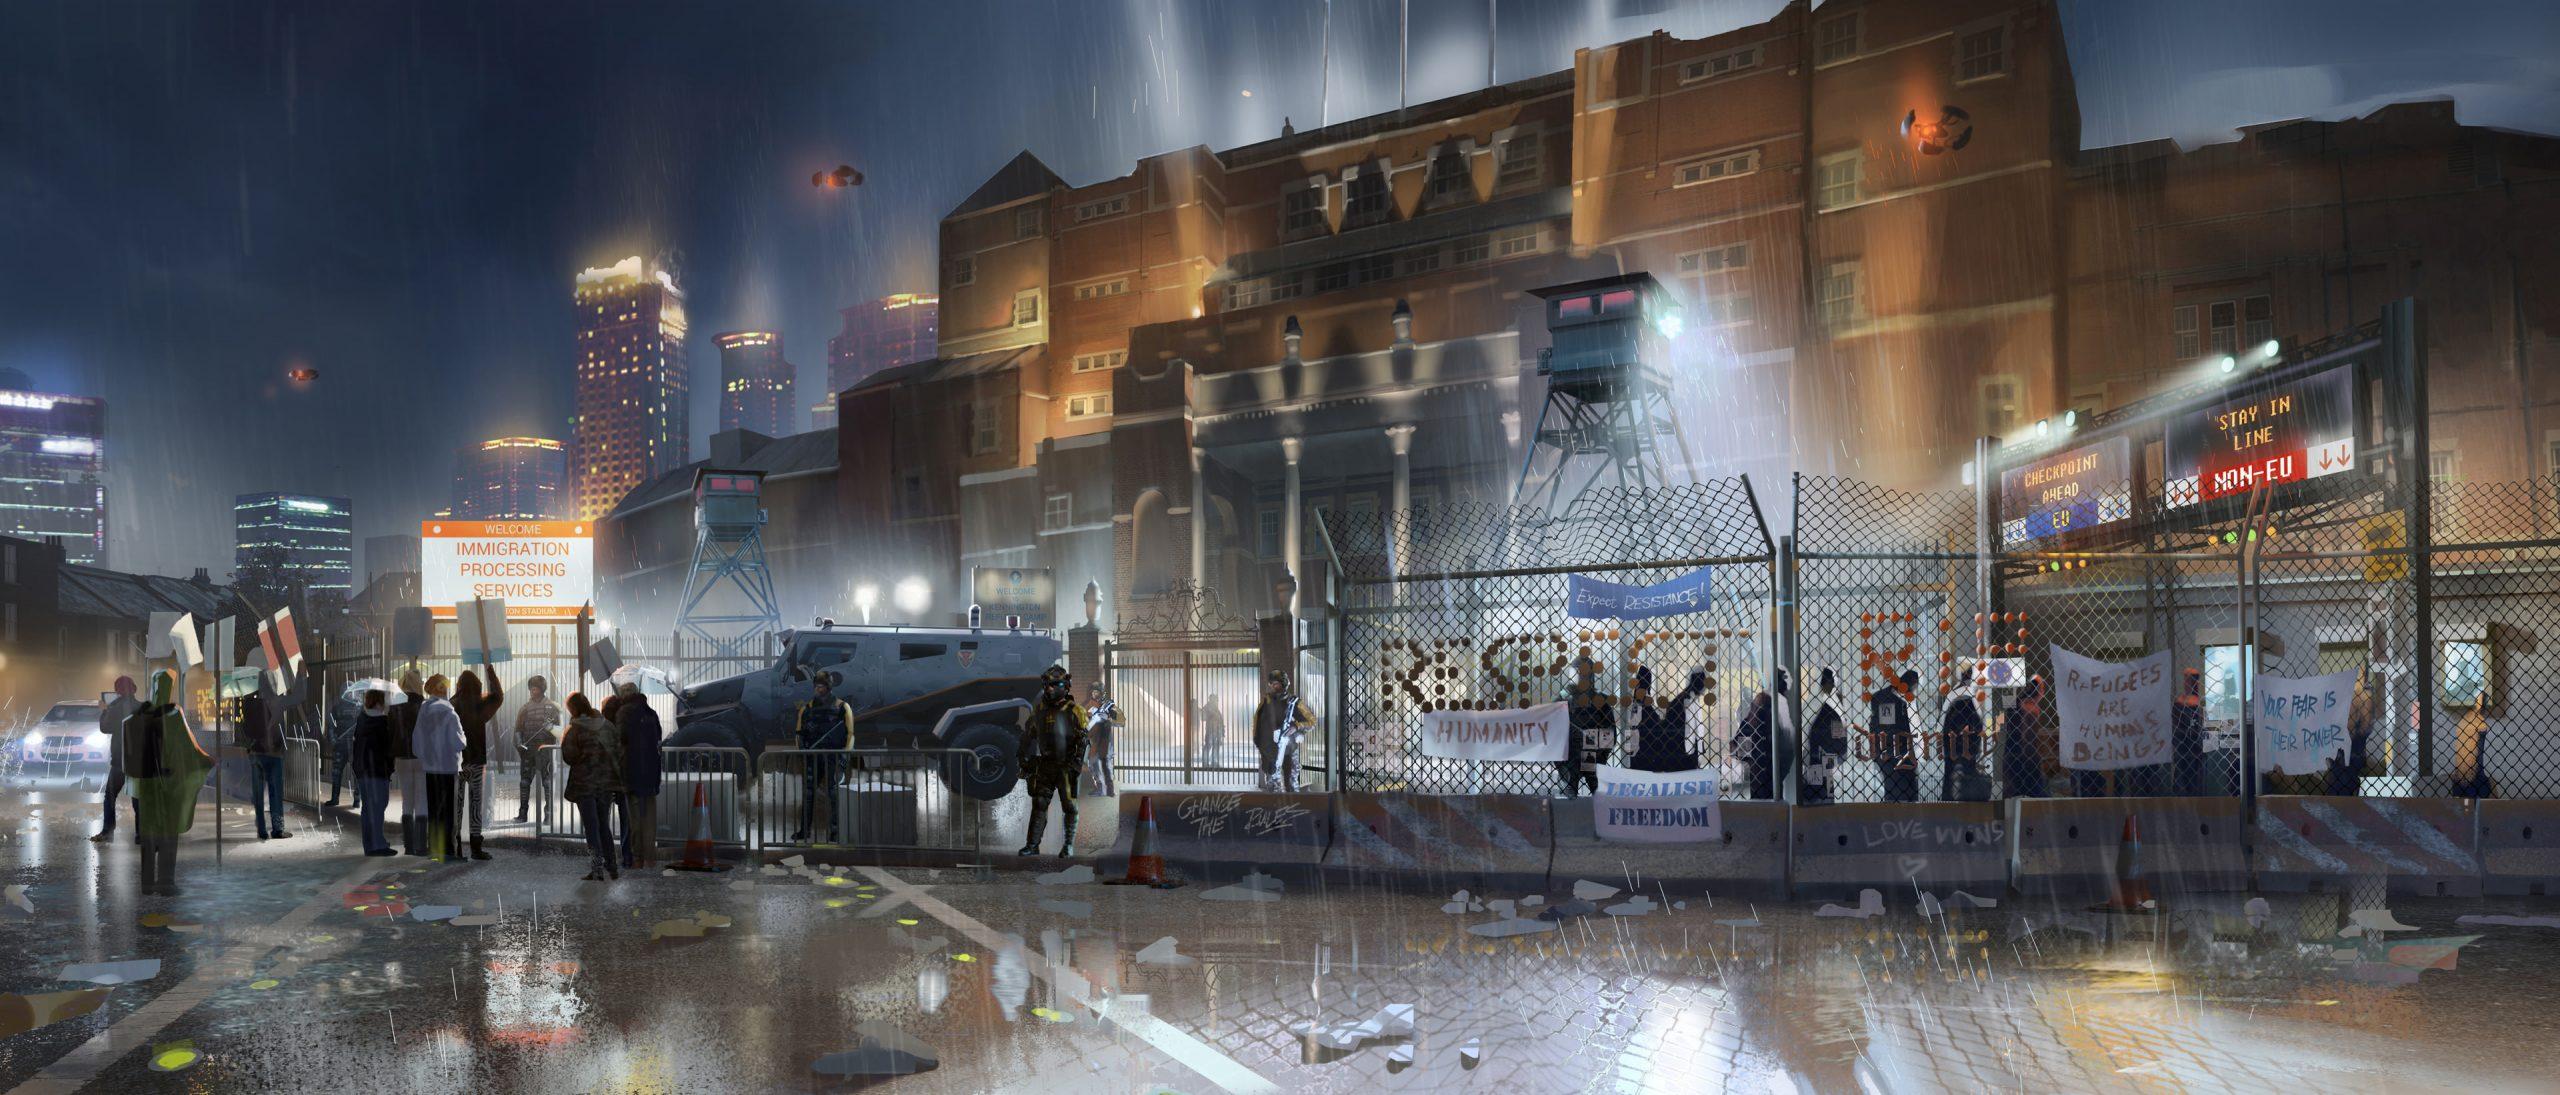 Watch Dogs: Legion multiplayer